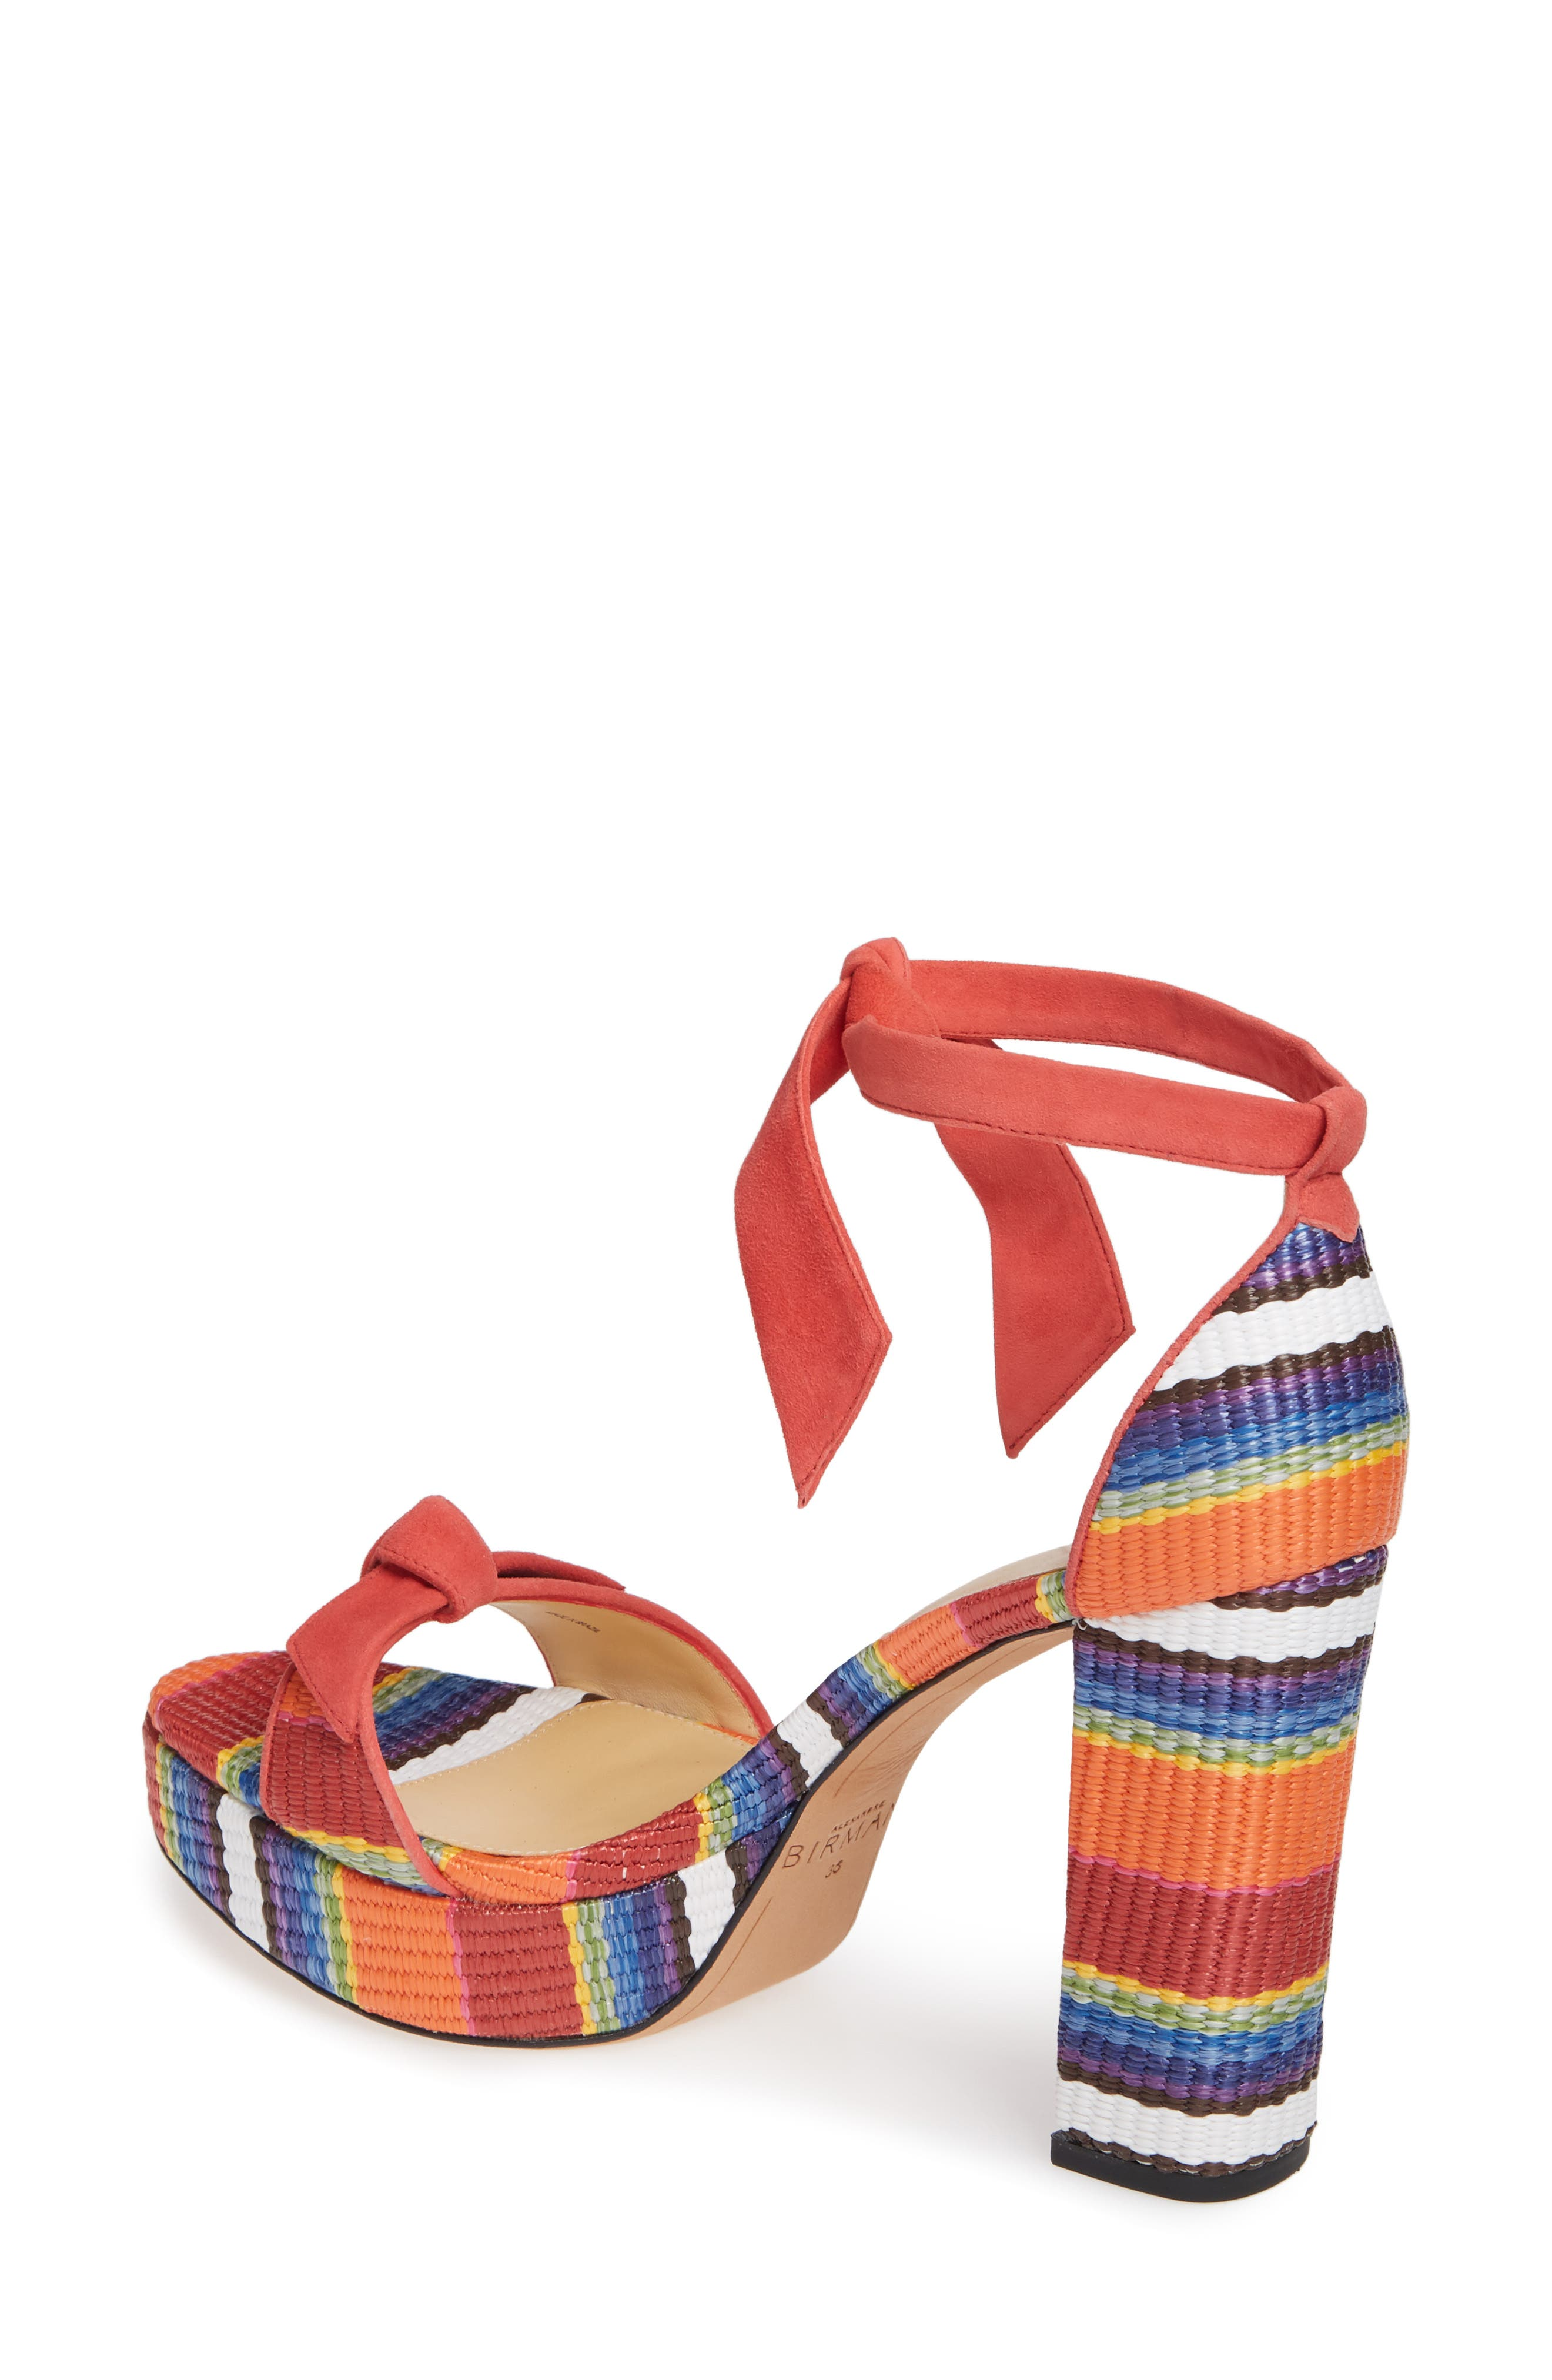 ALEXANDRE BIRMAN, Clarita Platform Sandal, Alternate thumbnail 2, color, CORAL MULTI